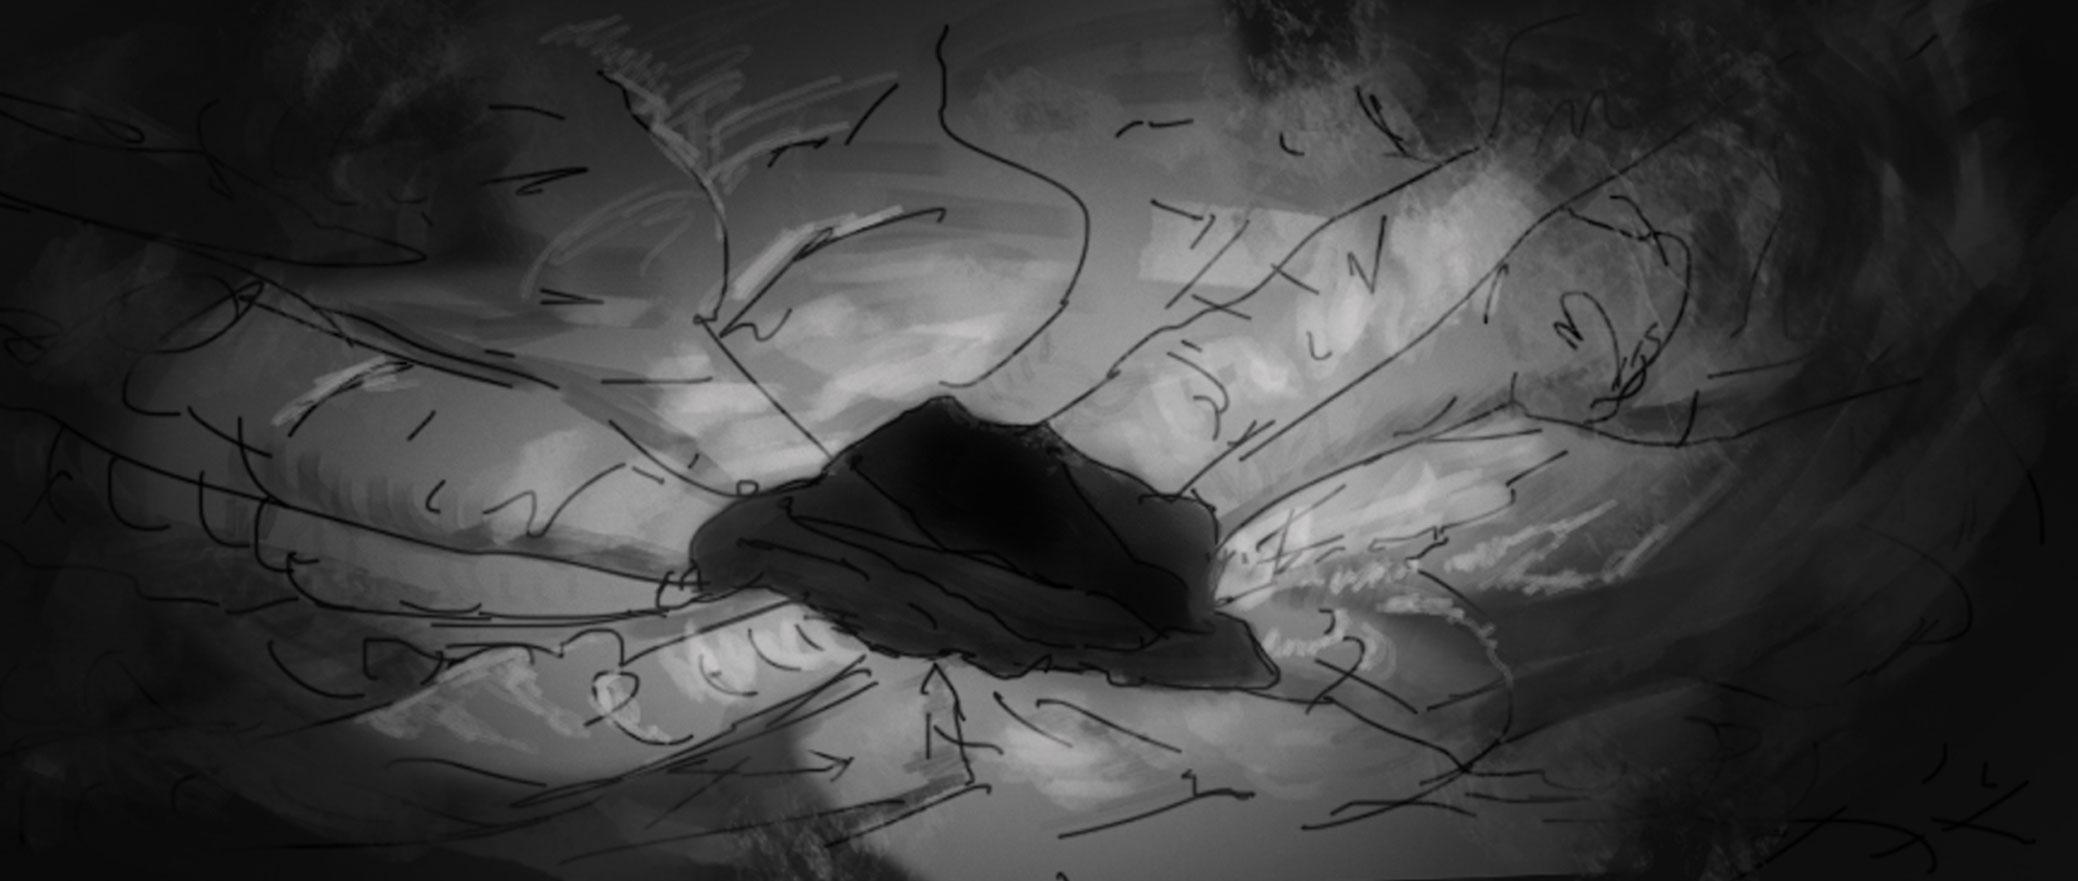 Wraiths_2019Animatic_Thumbsheet-02_58.jpg